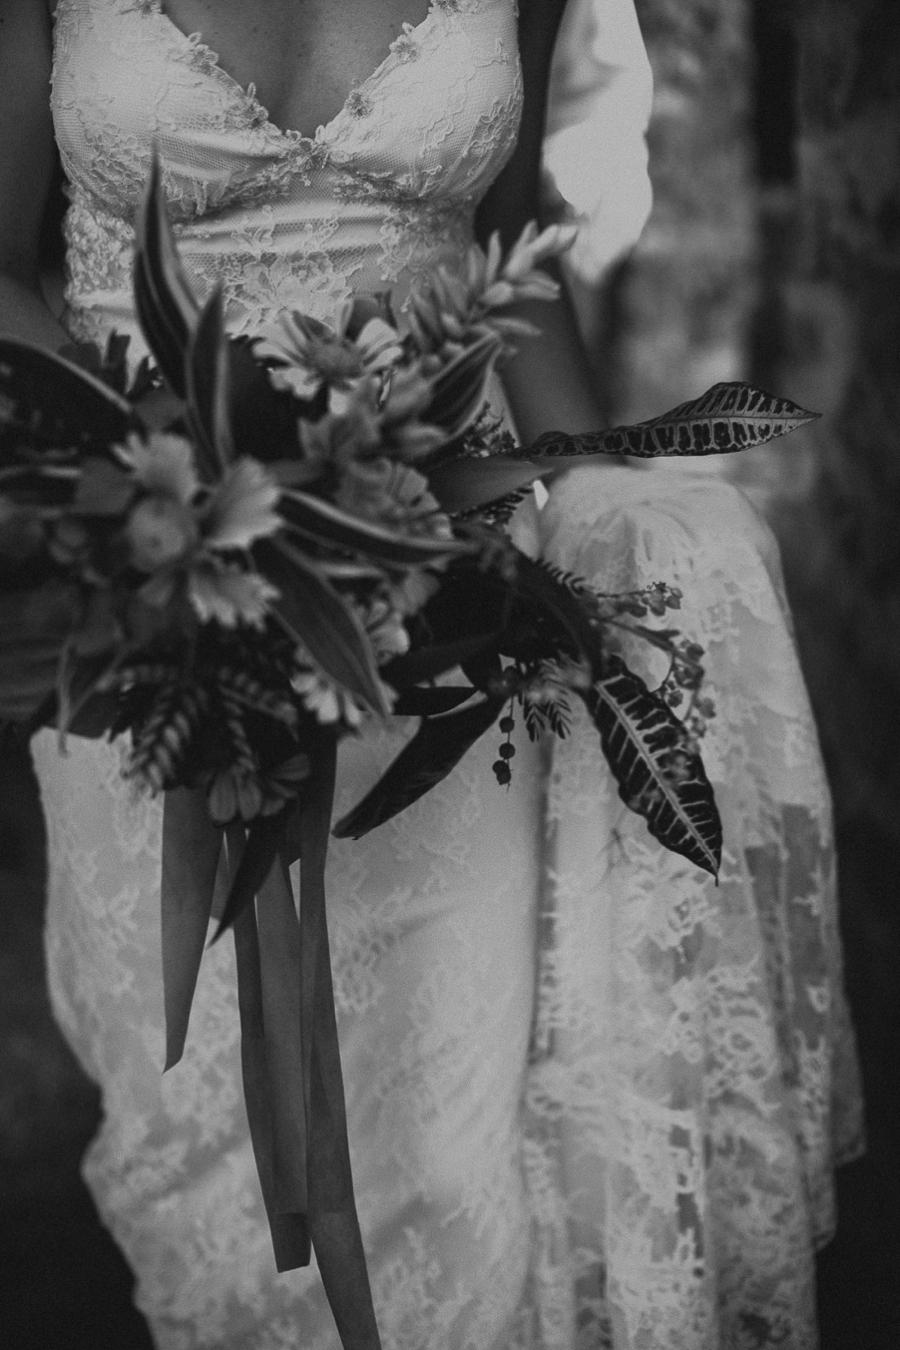 St_Croix_Wedding_Abi_Q_Photography_-143.jpg